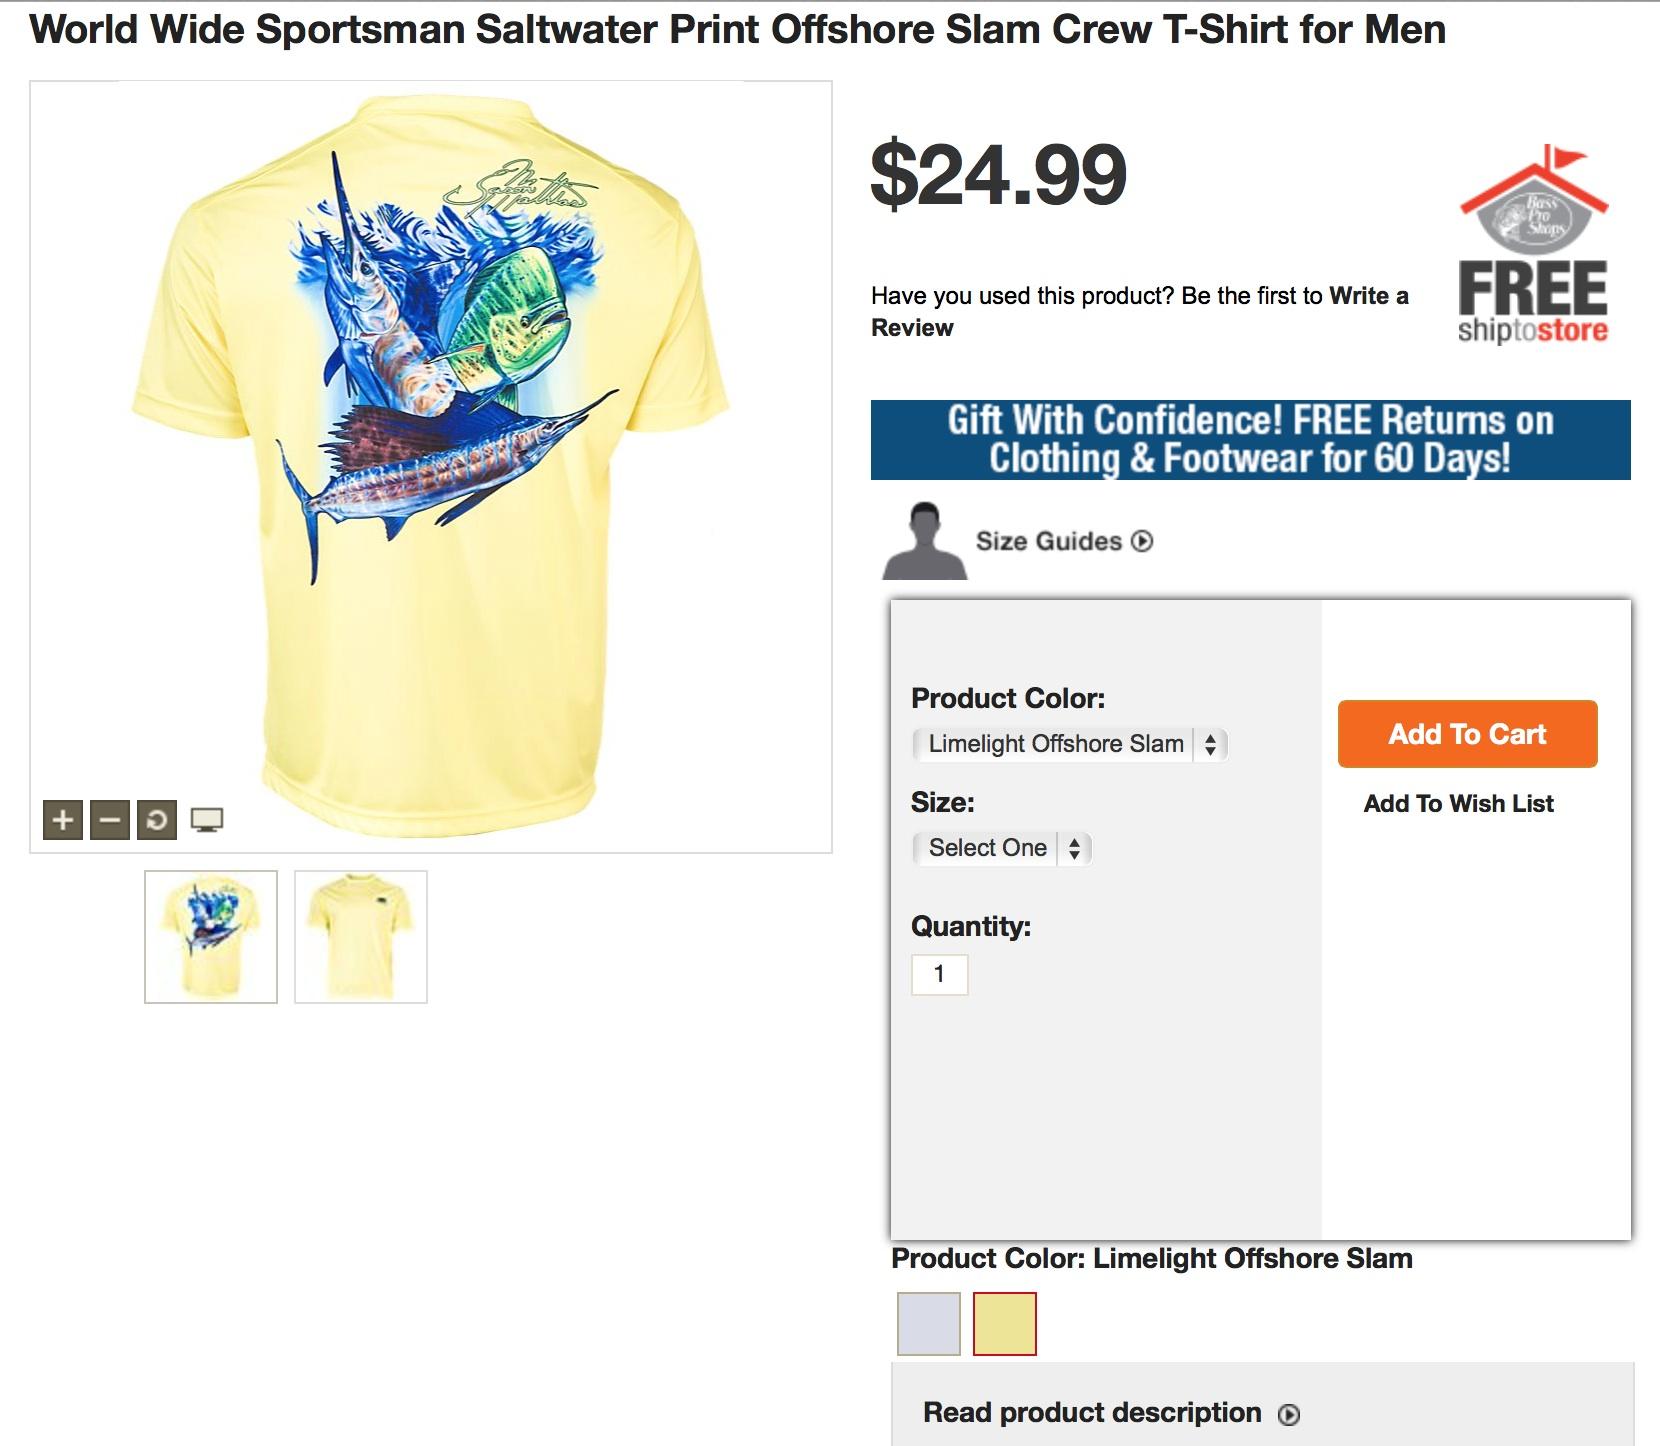 jason-mathias-offshore-slam-shirt.jpg